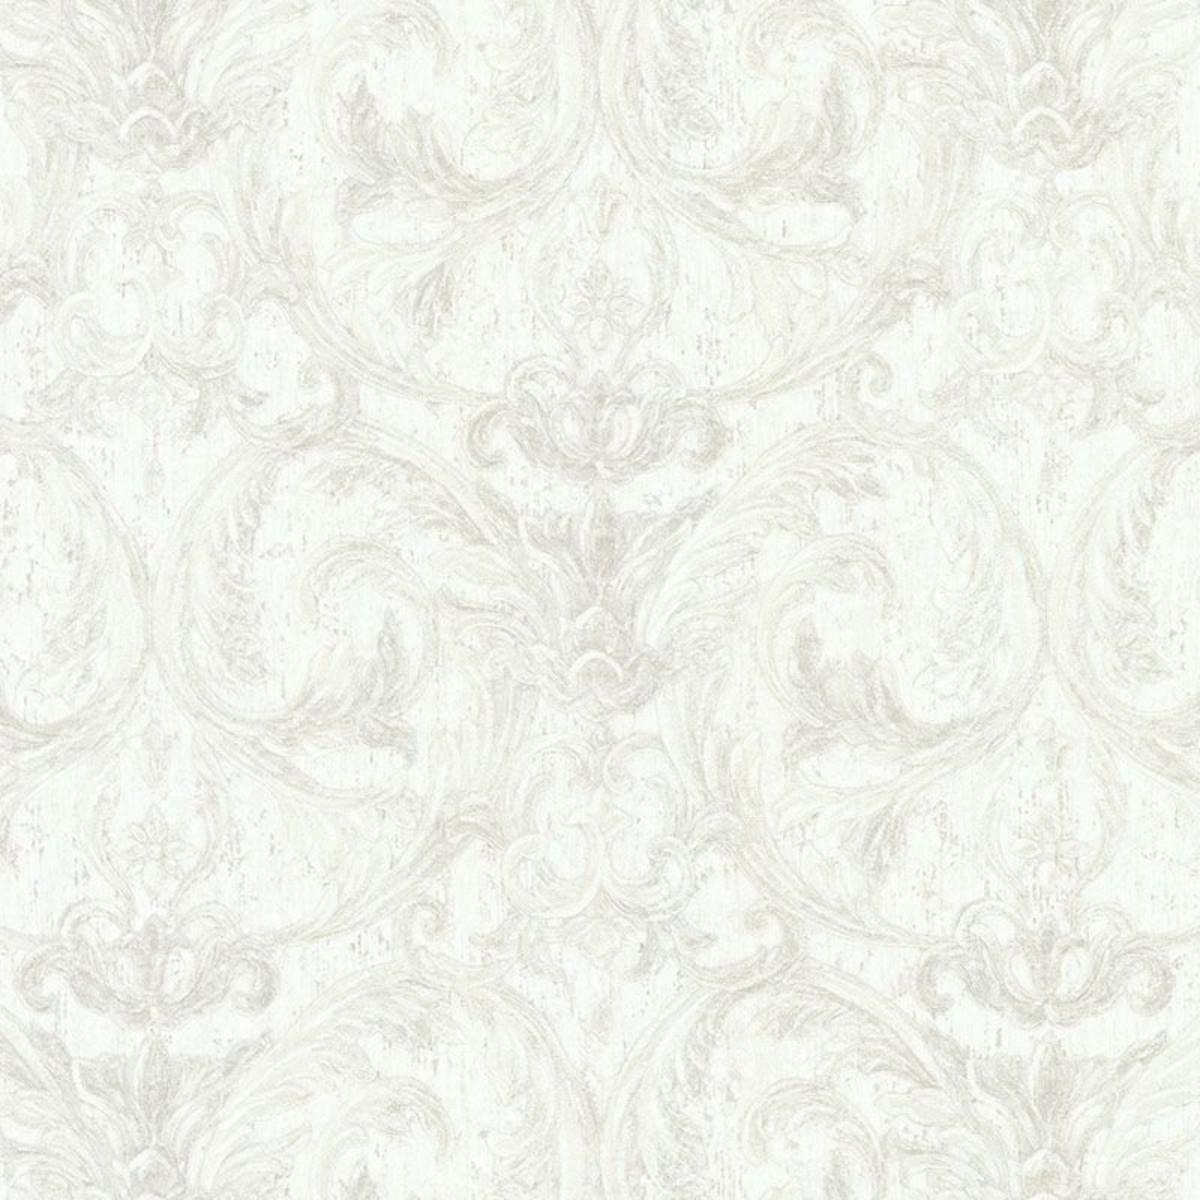 Обои флизелиновые Decori-Decori Altera бежевые 1.06 м 82303